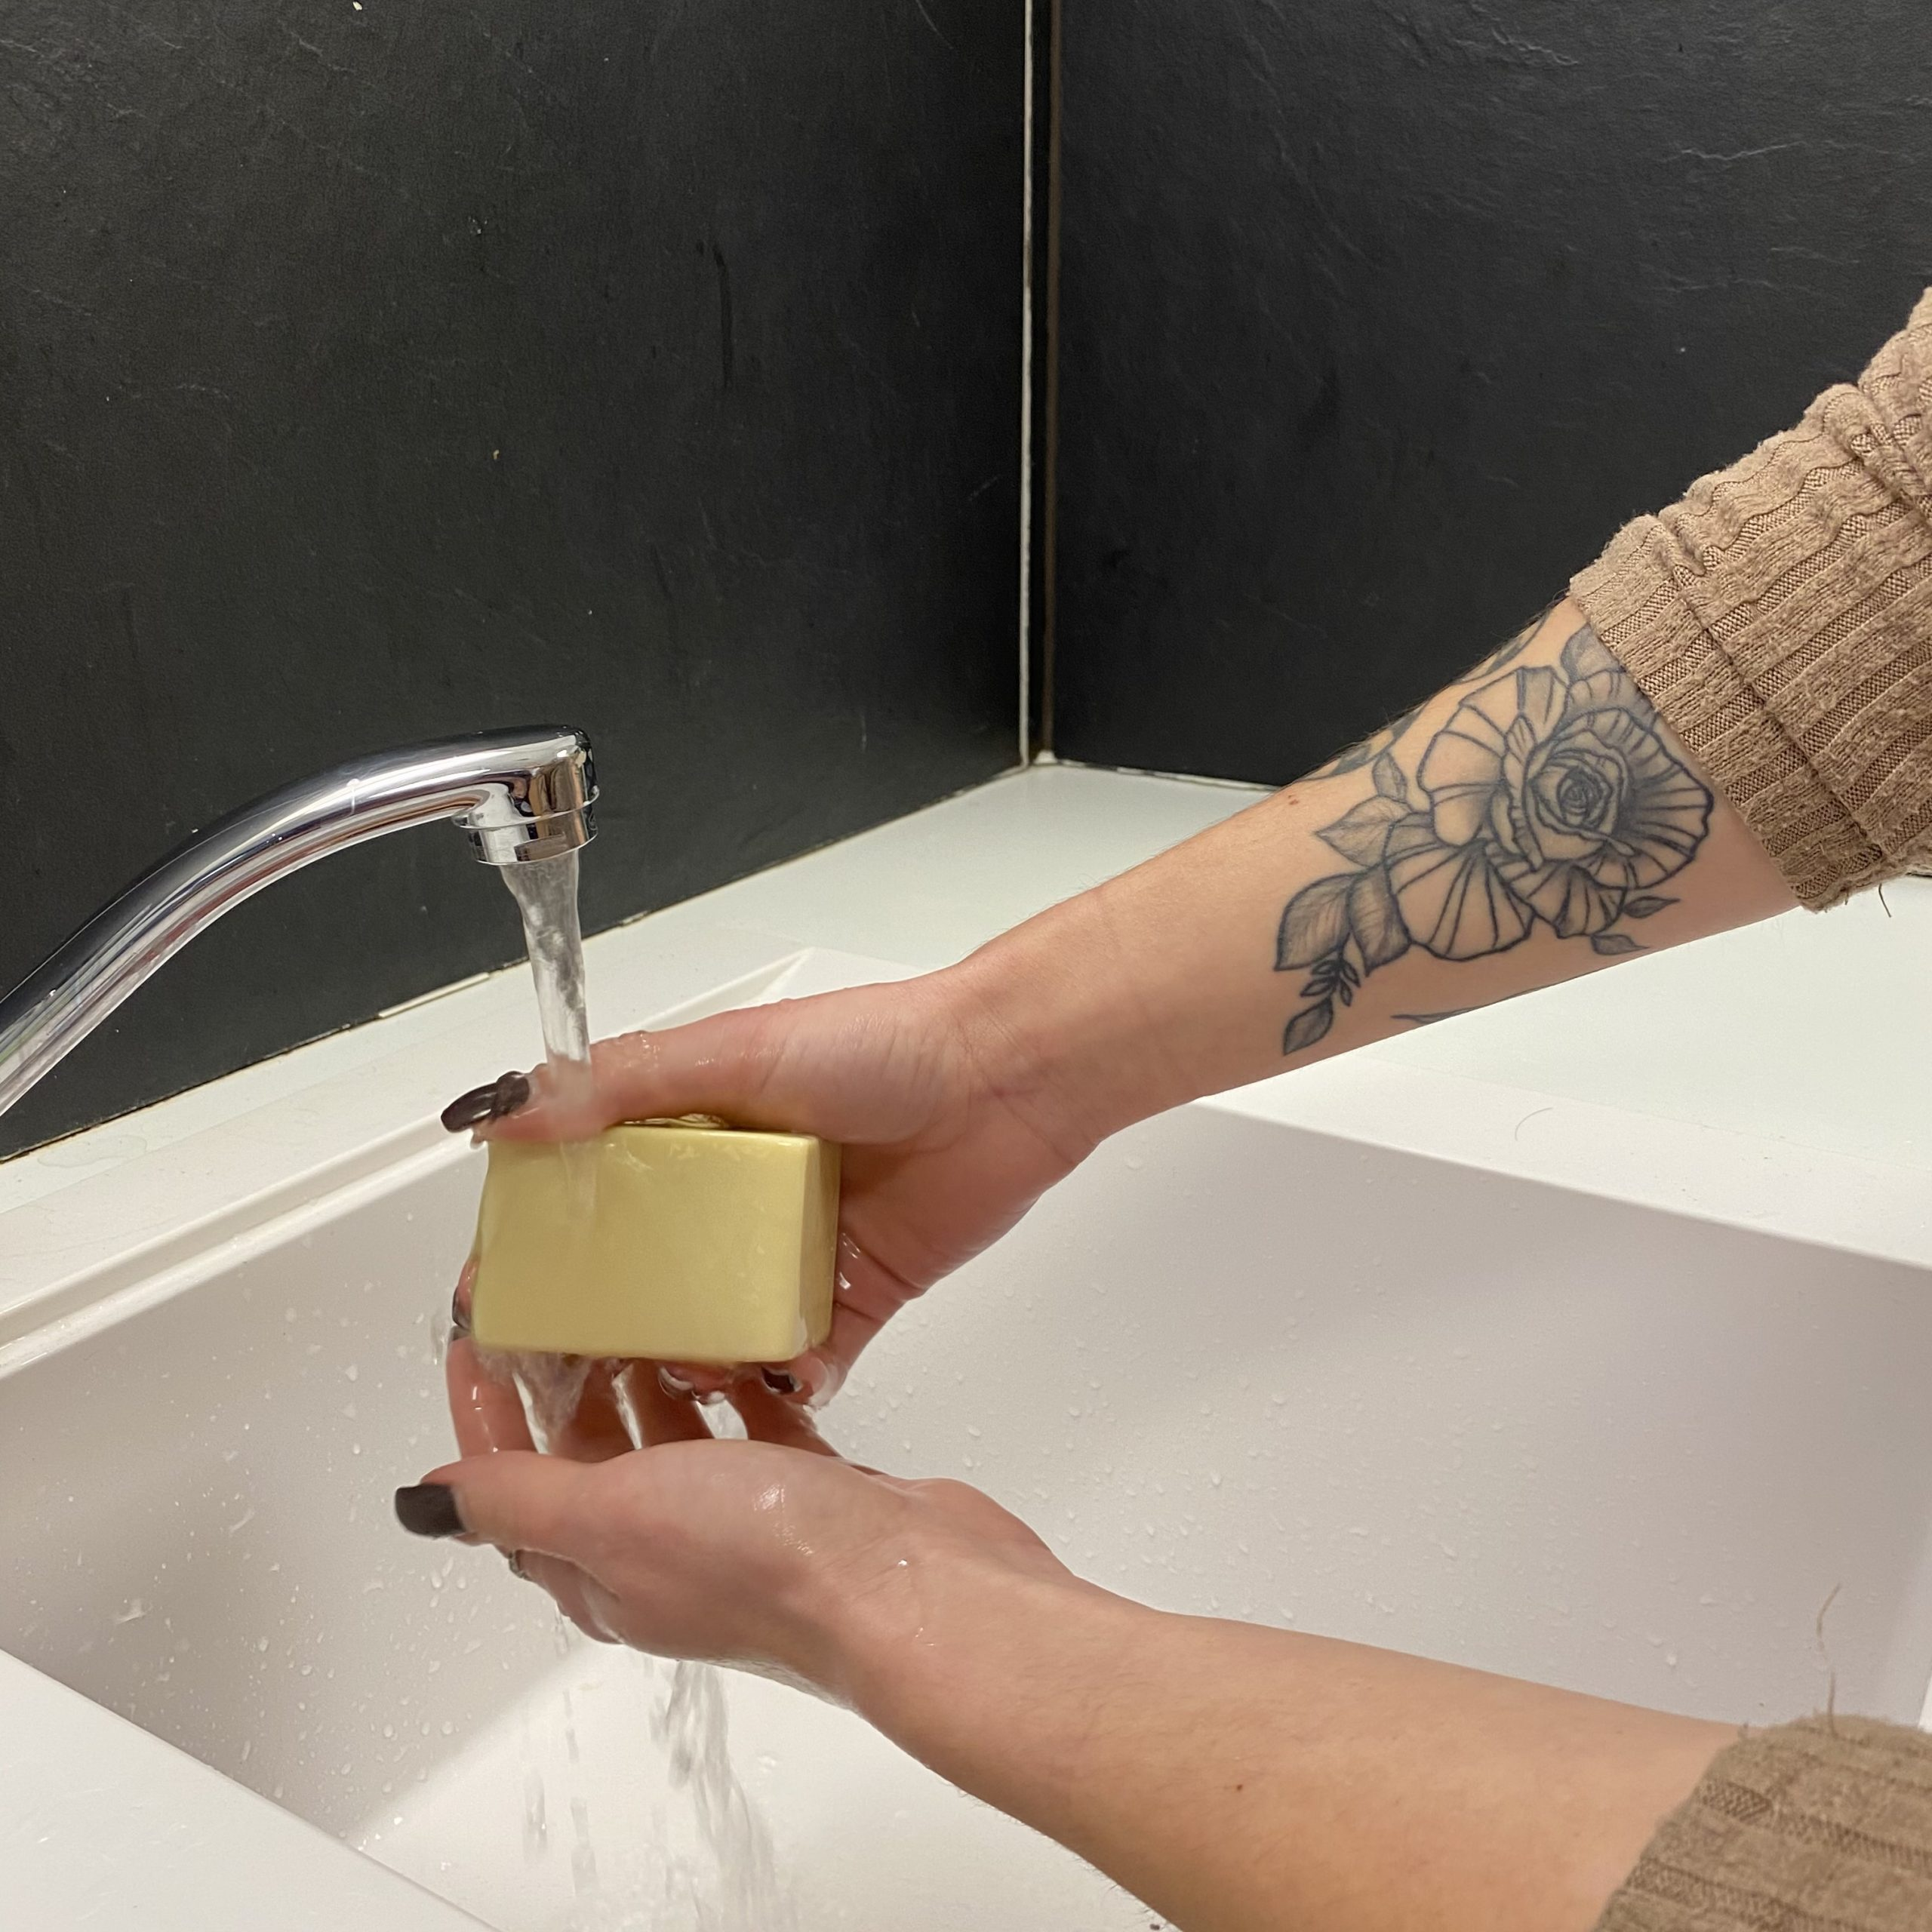 Lavage mains gel hydroalcoolique coronavirus savon naturel Patachons